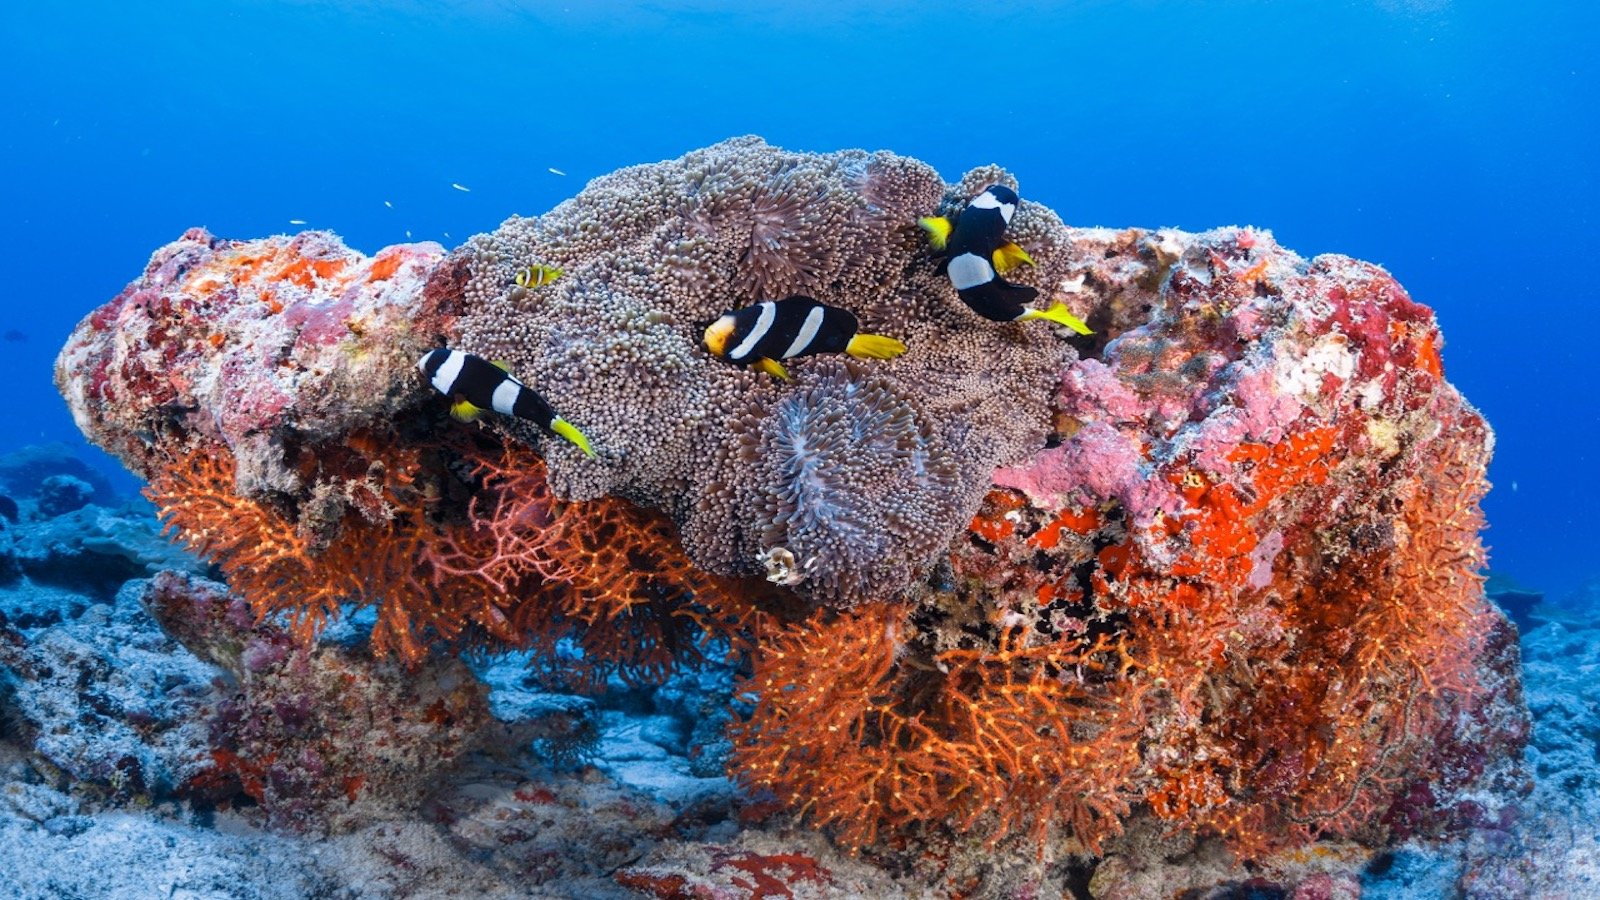 How to spot marine Life